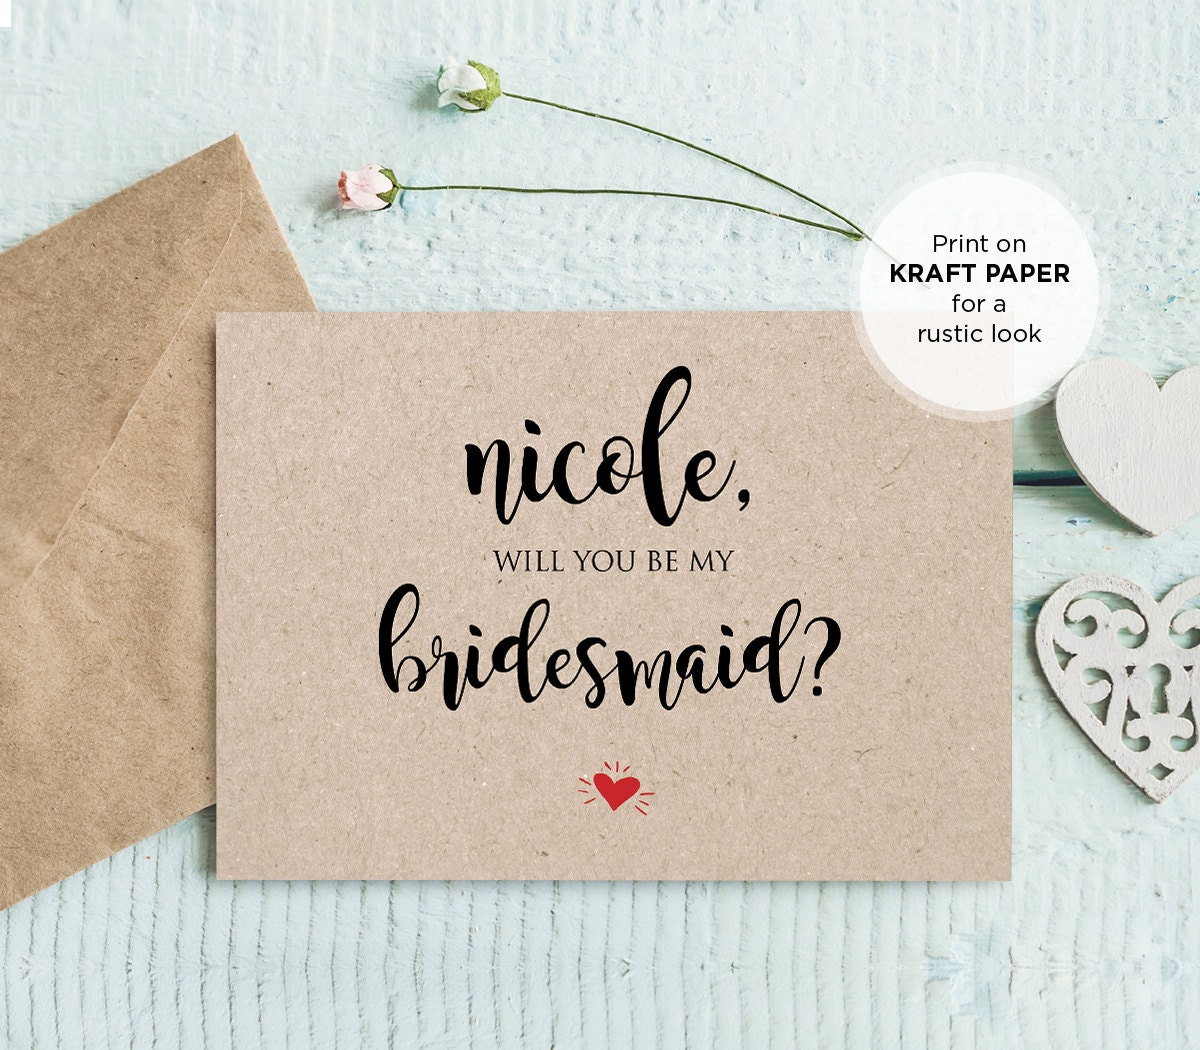 Will You Be My Bridesmaid Printable Card, DIY Ask to be Bridesmaid ...